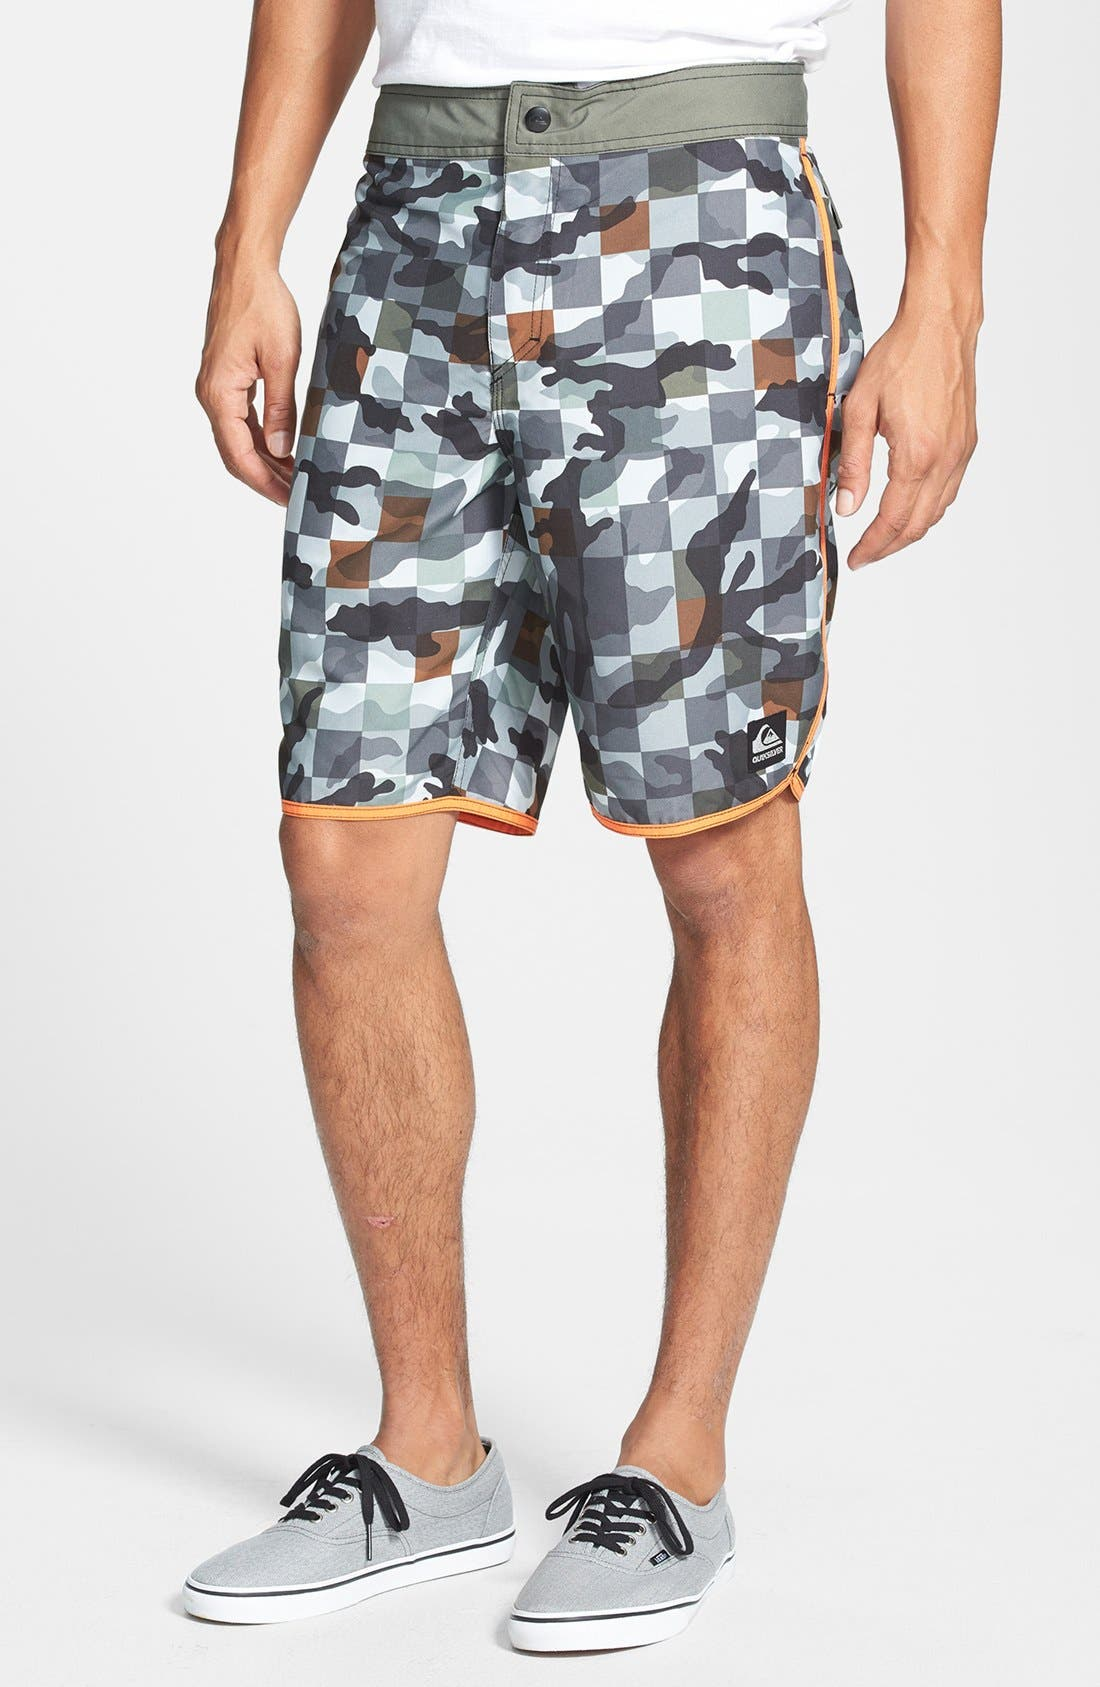 Alternate Image 1 Selected - Quiksilver 'Scallopuss' Print Hybrid Shorts